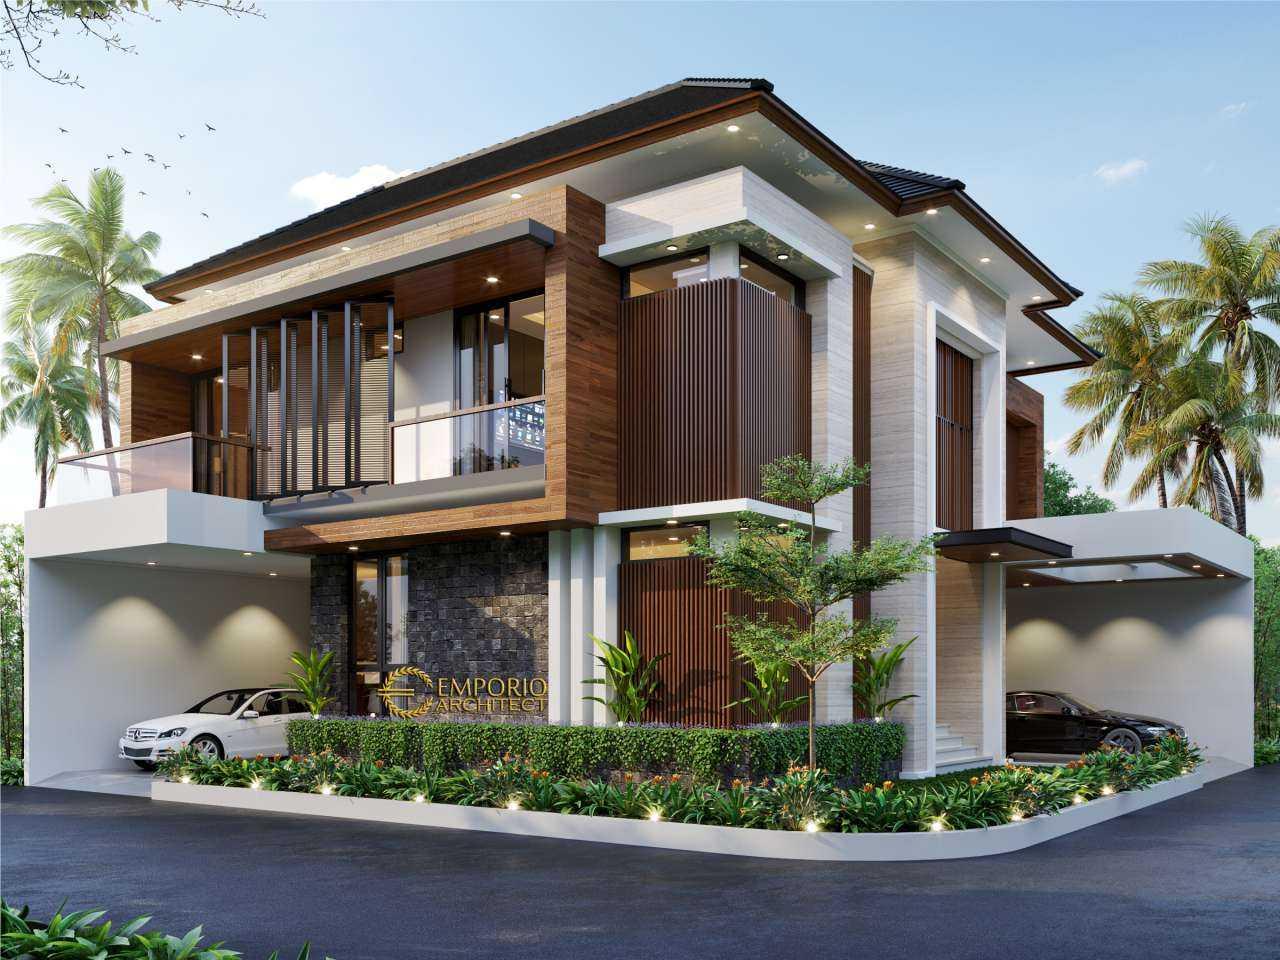 Emporio Architect Jasa Arsitek Cibubur Desain Rumah Modern 2 Lantai 768 @ Cibubur, Bekasi Cibubur, Kec. Ciracas, Kota Jakarta Timur, Daerah Khusus Ibukota Jakarta, Indonesia Cibubur, Kec. Ciracas, Kota Jakarta Timur, Daerah Khusus Ibukota Jakarta, Indonesia Emporio-Architect-Jasa-Arsitek-Cibubur-Desain-Rumah-Modern-2-Lantai-768-Cibubur-Bekasi Modern  87491